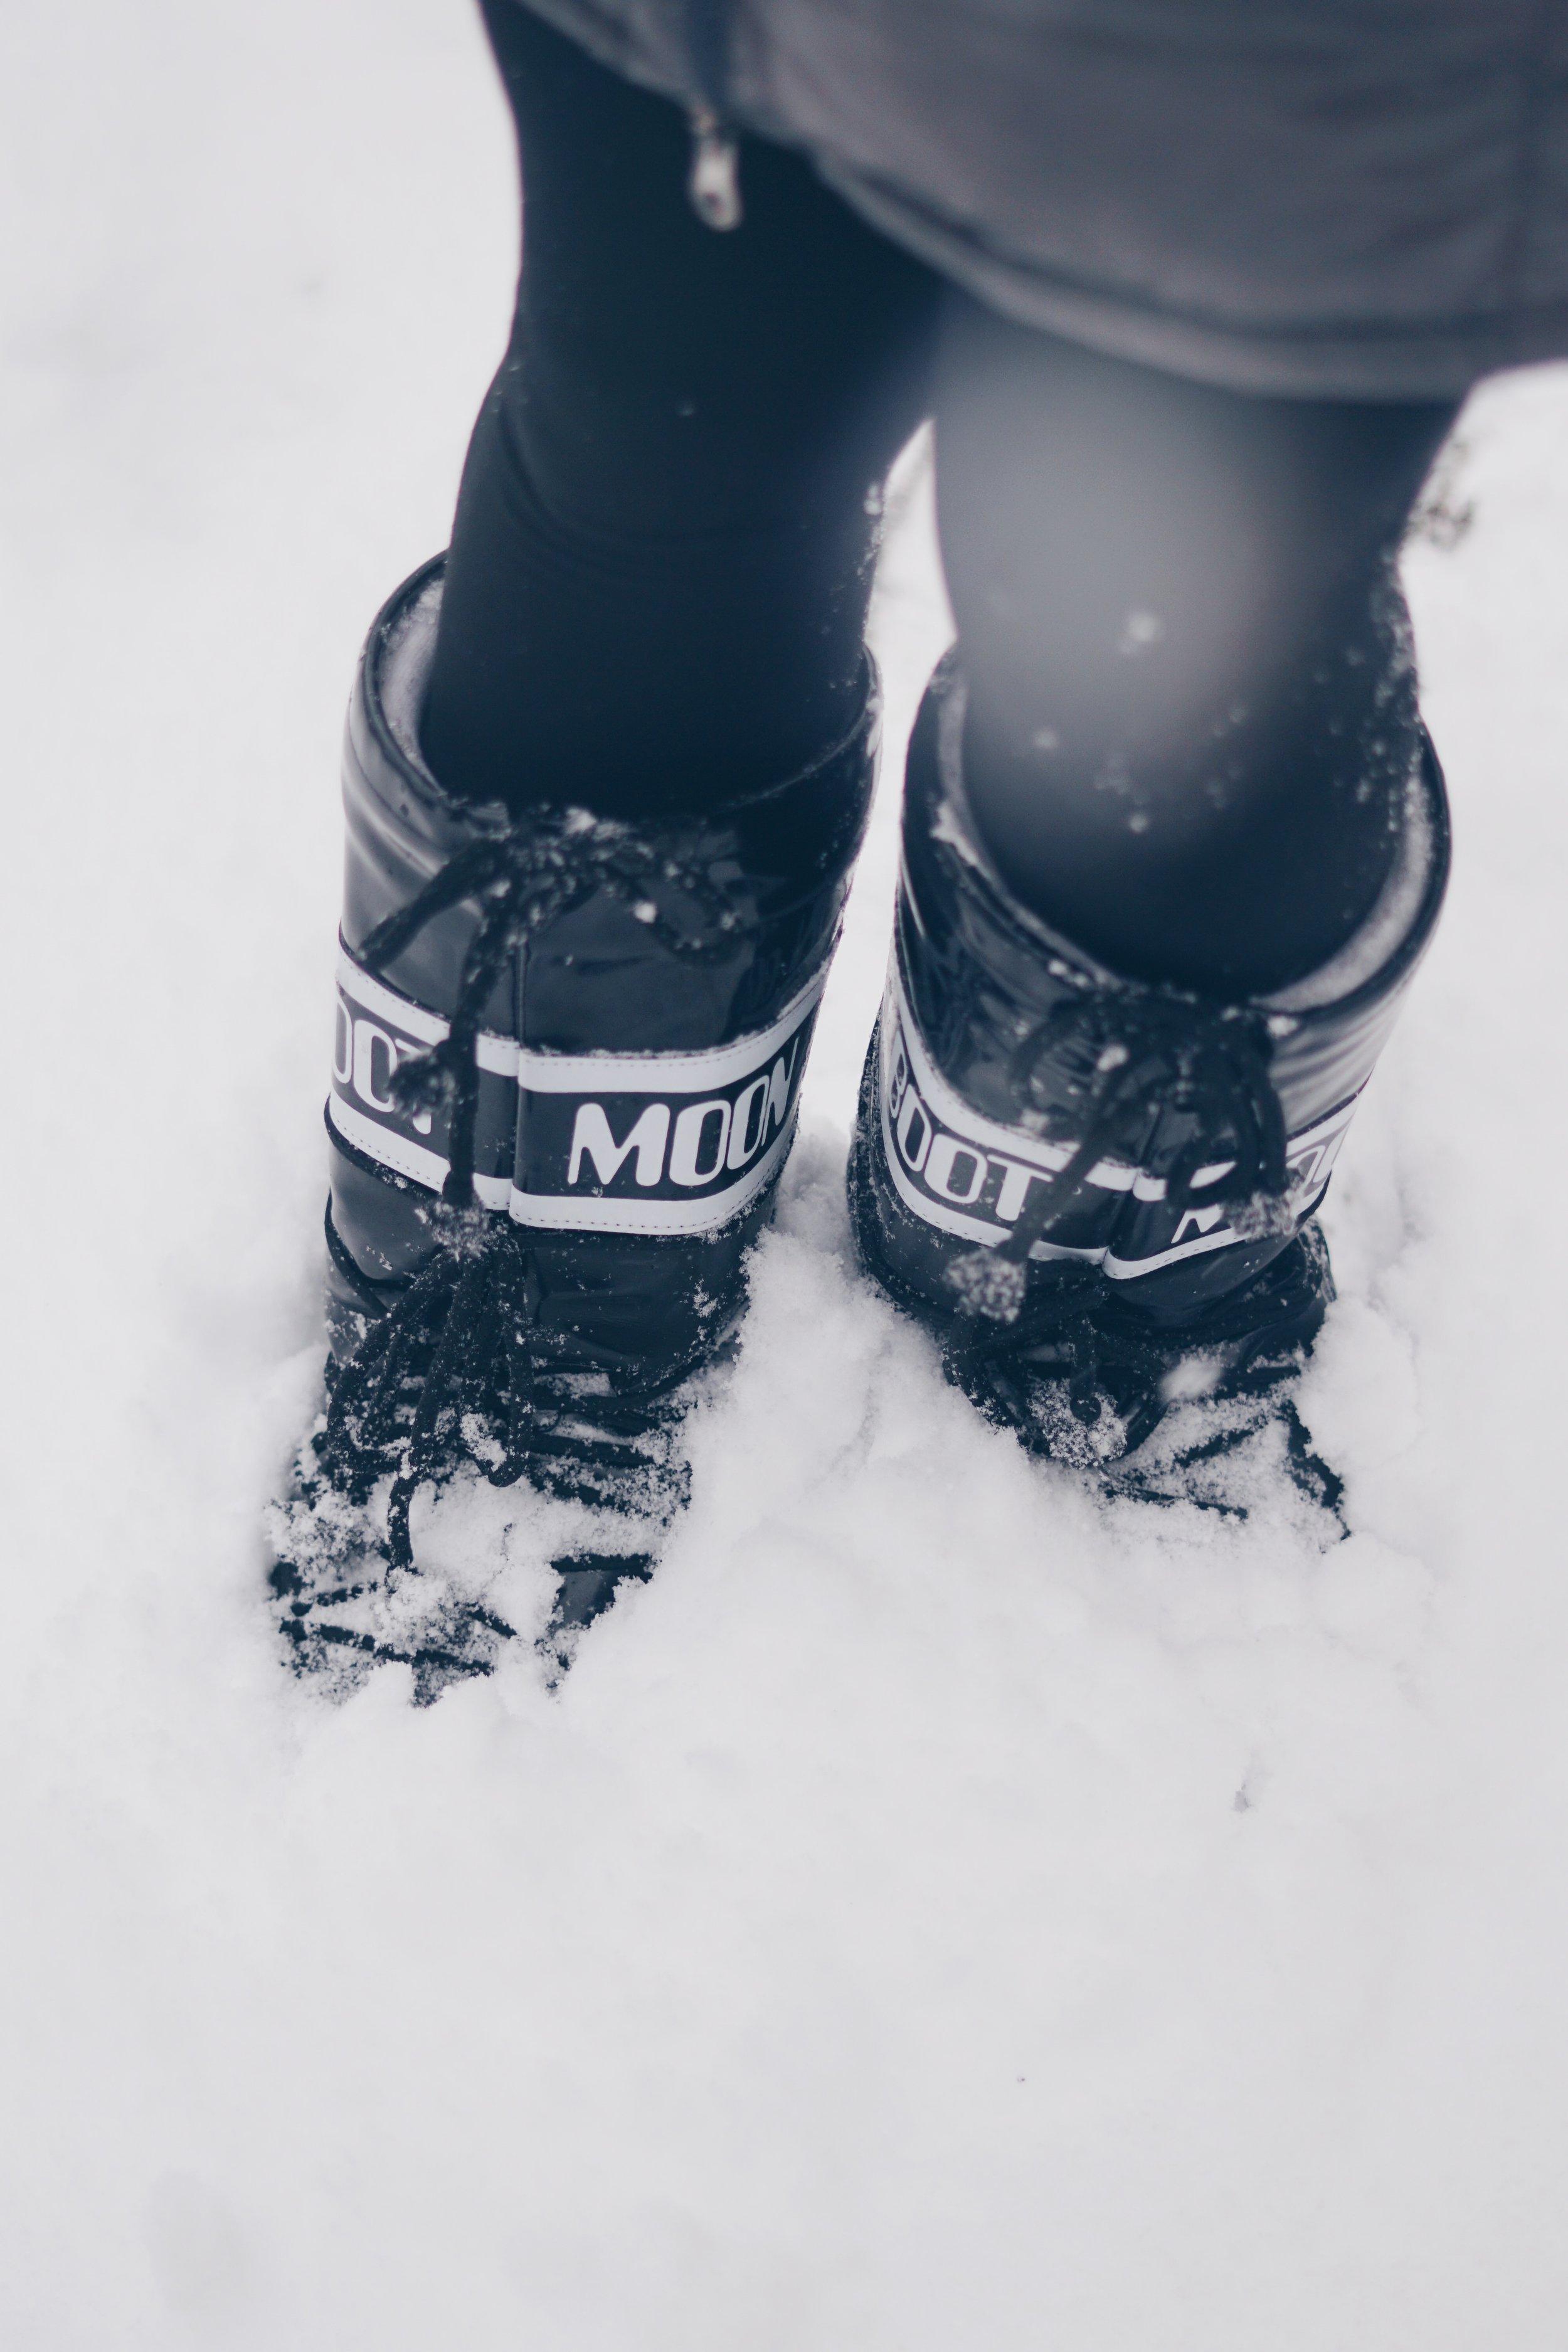 risa xu moon boots snow central park